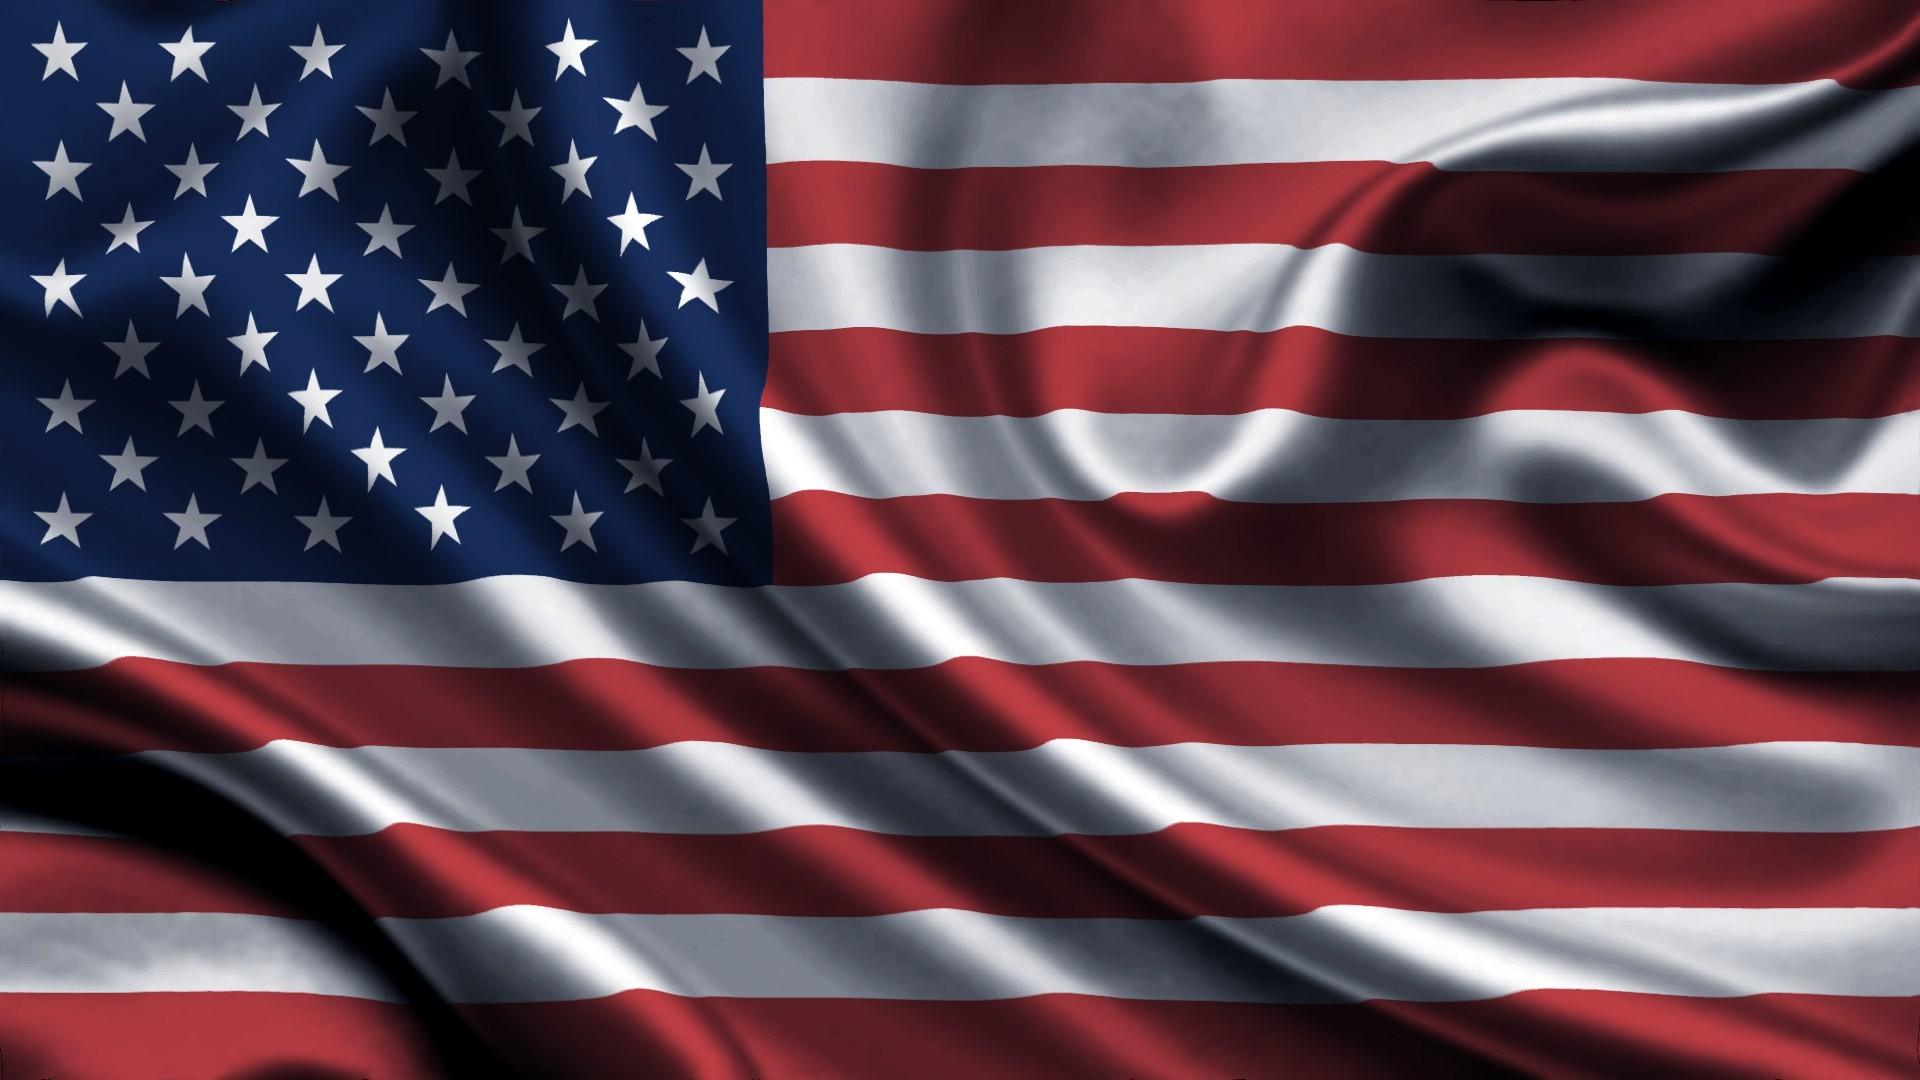 american flag desktop backgrounds wallpaper – american flag category